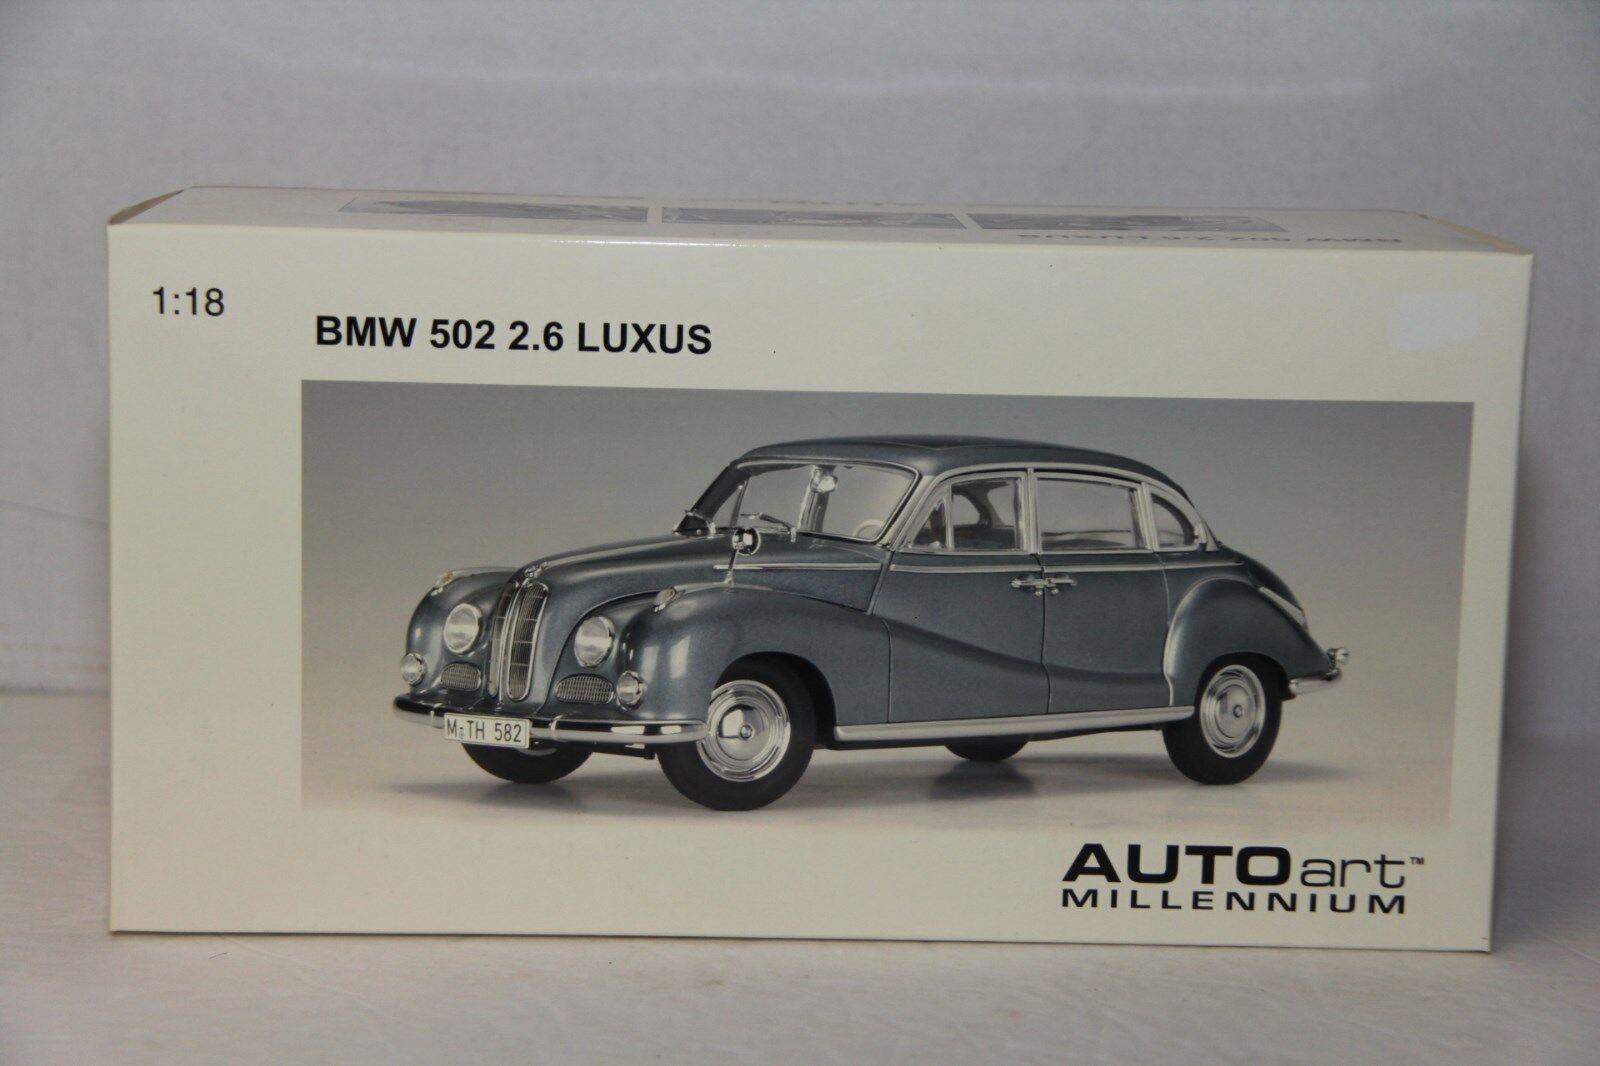 Autoart BMW 502 2.6 Luxus, Acero Azul Metálico 70592, nuevo